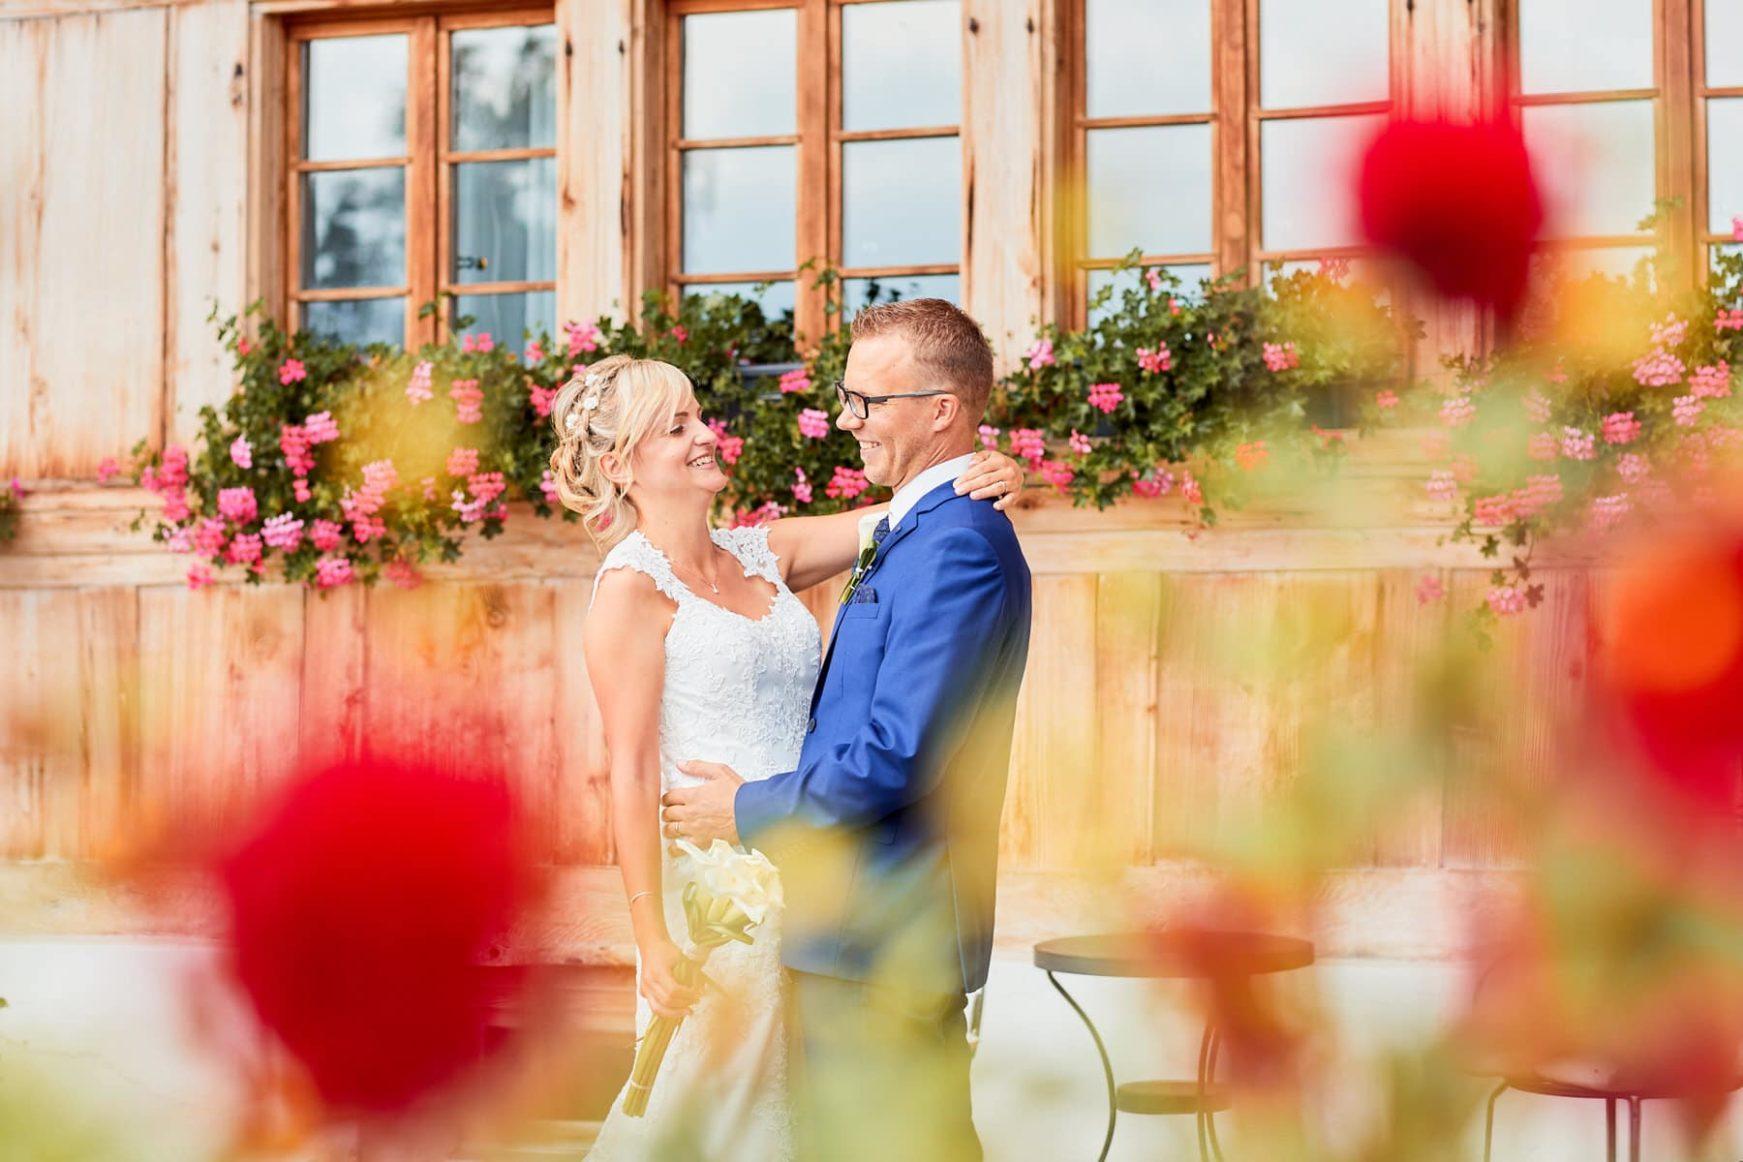 photographe mariage suisse romande fribourg vaud valais